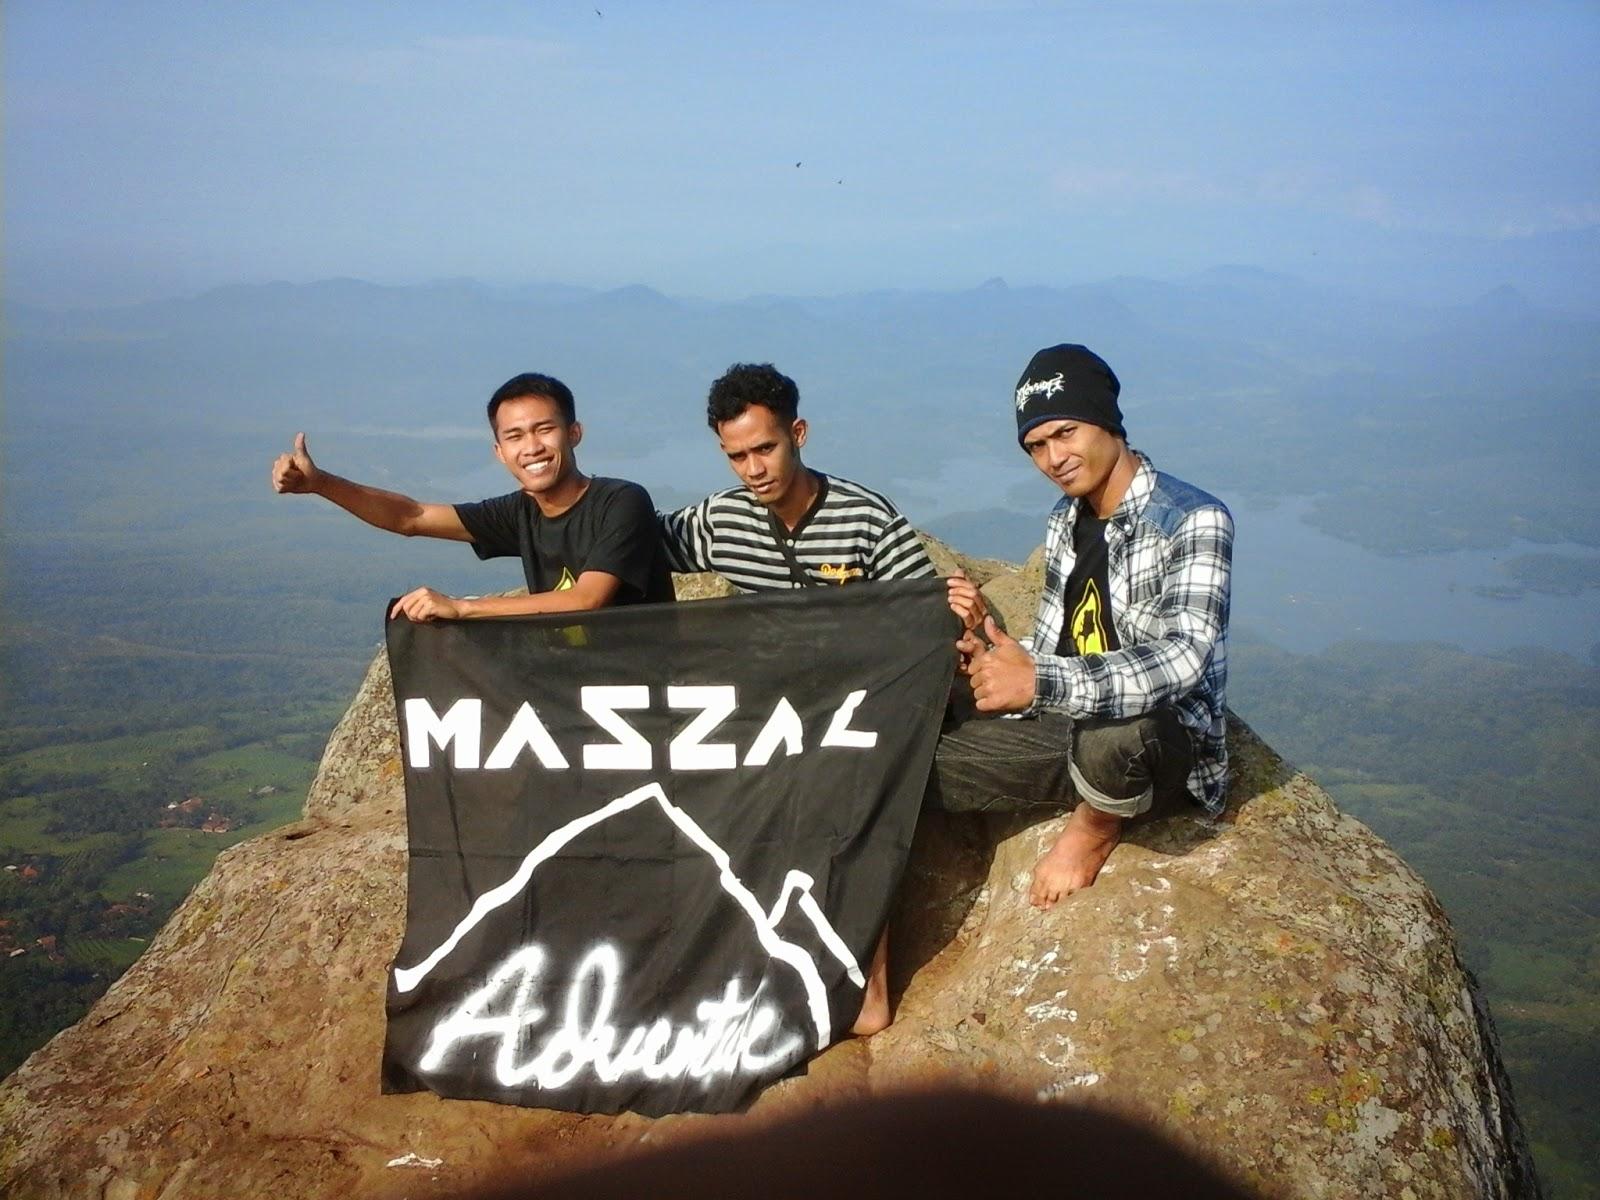 Wisata Tracking Gunung Bongkok Purwakarta Jawa Barat